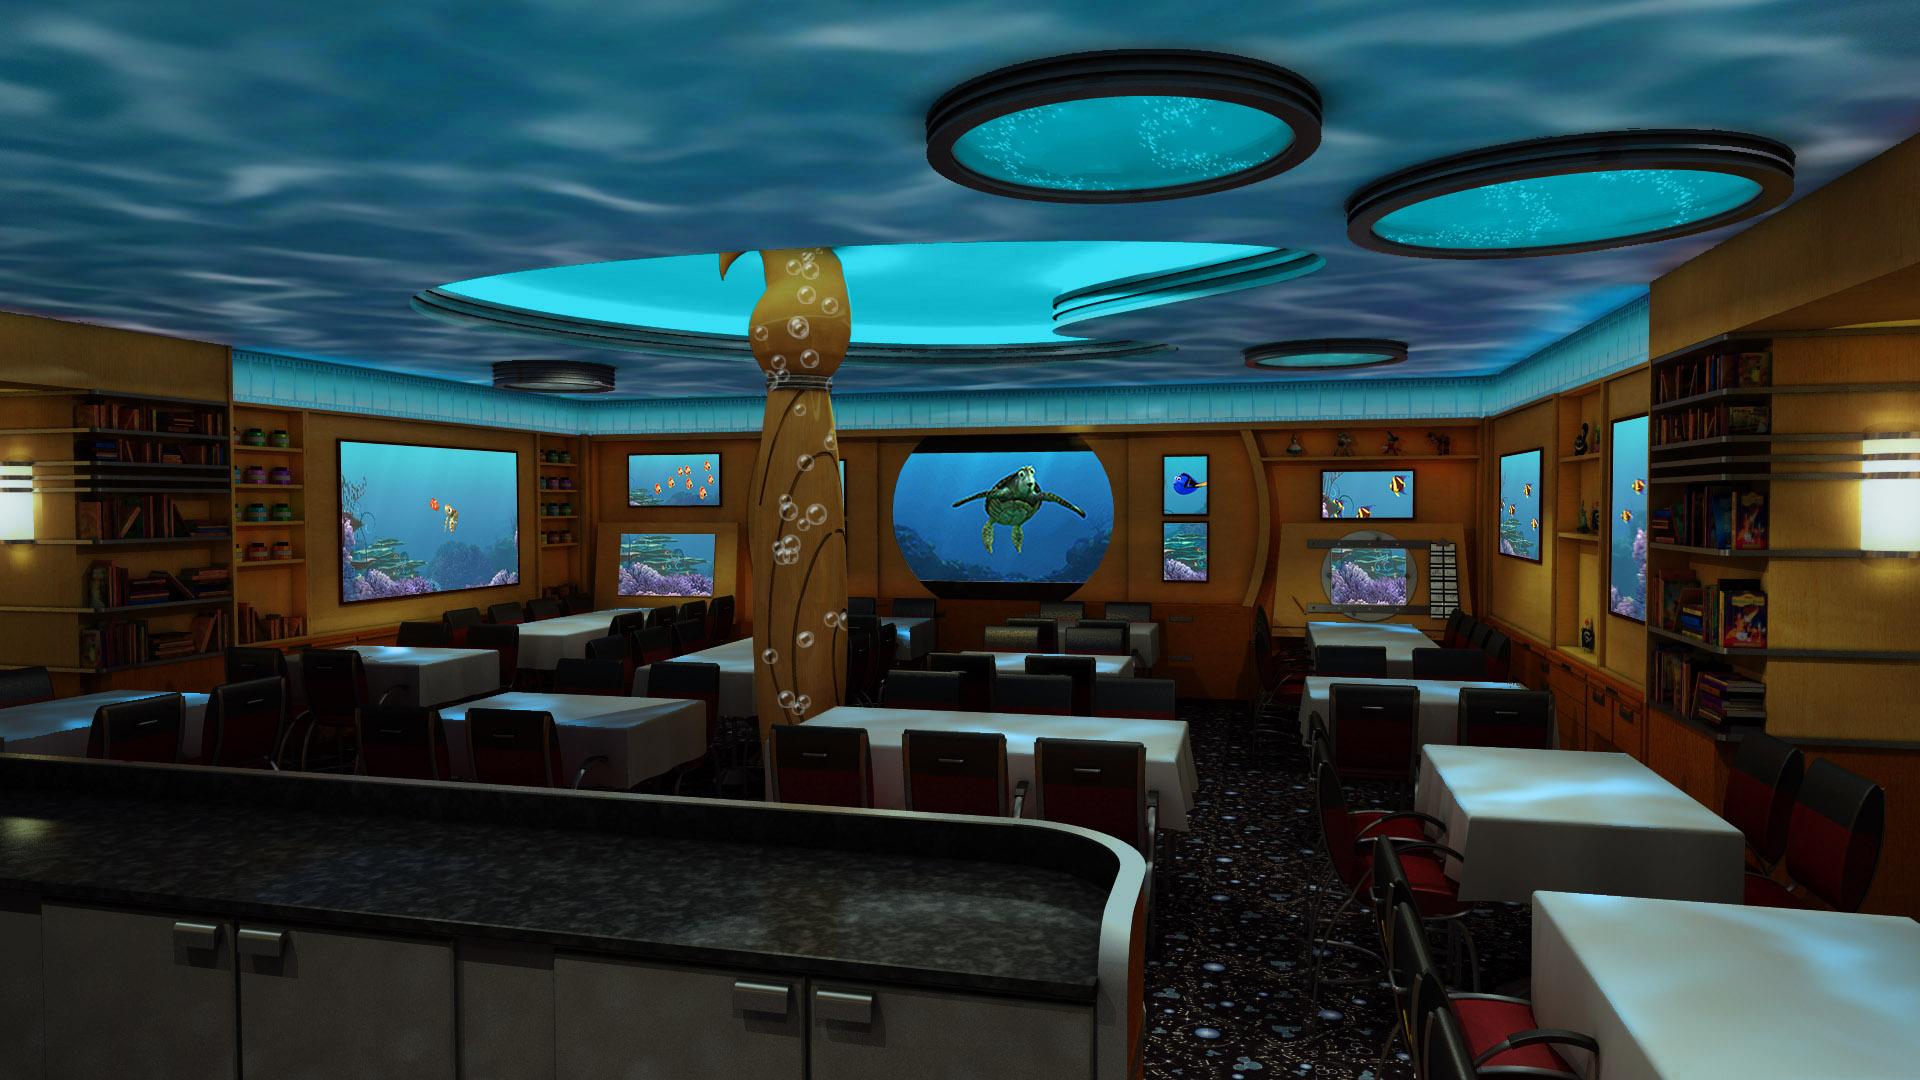 Disney Dream Cruise Ship wallpaper   87792 1920x1080